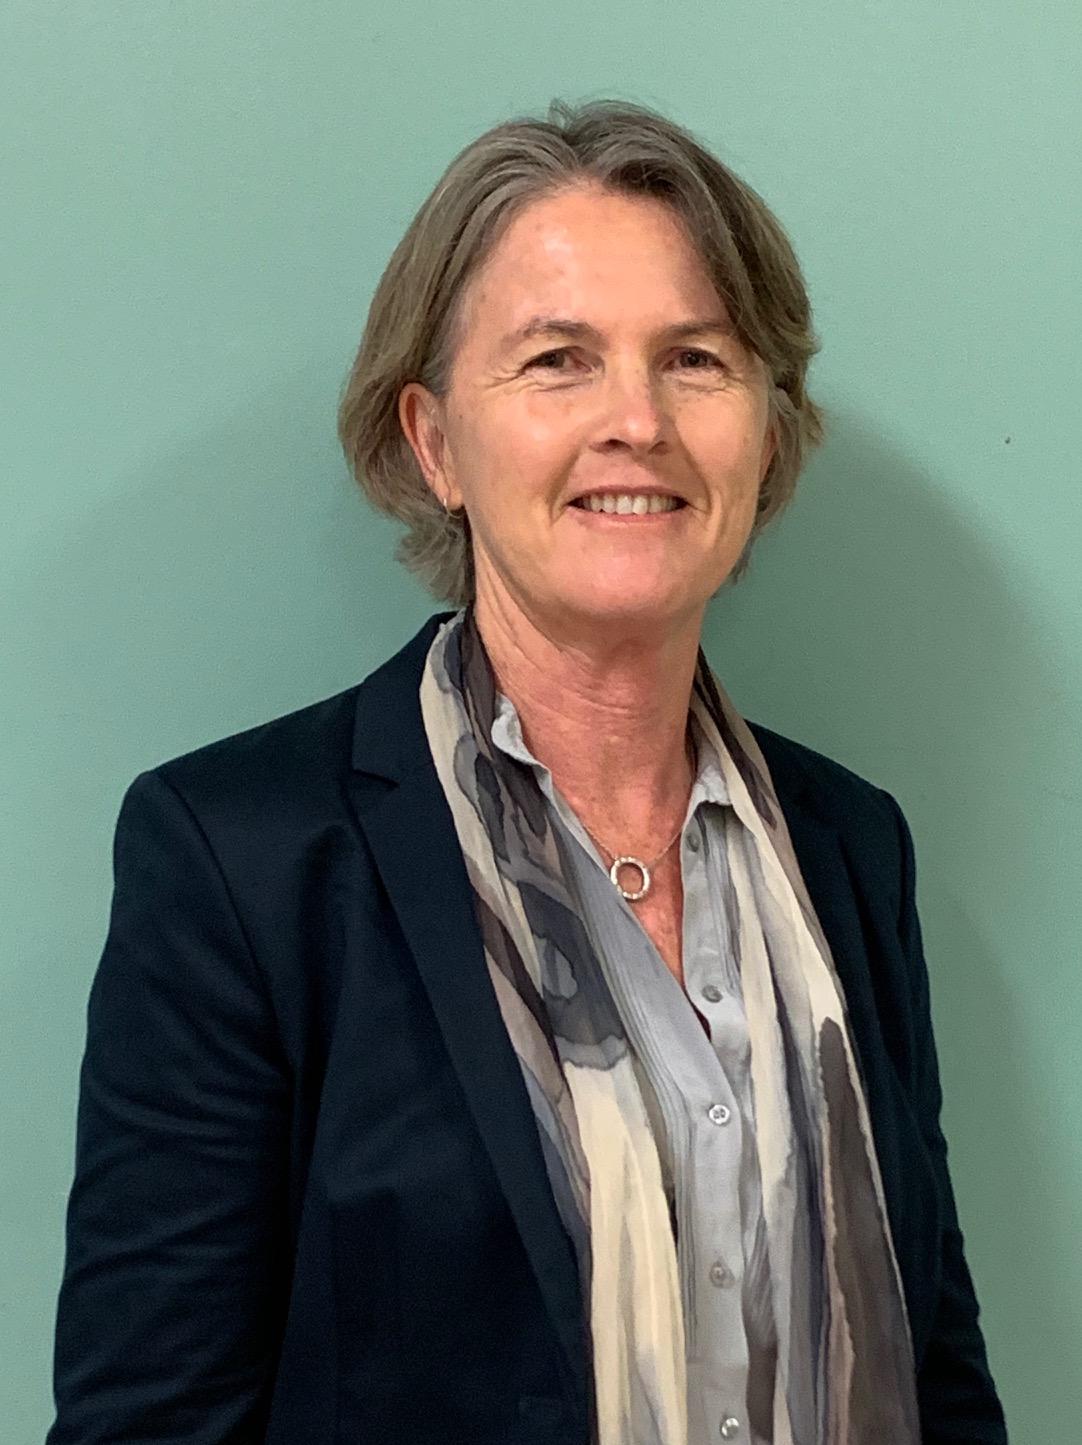 Susan-Maree Jacobs